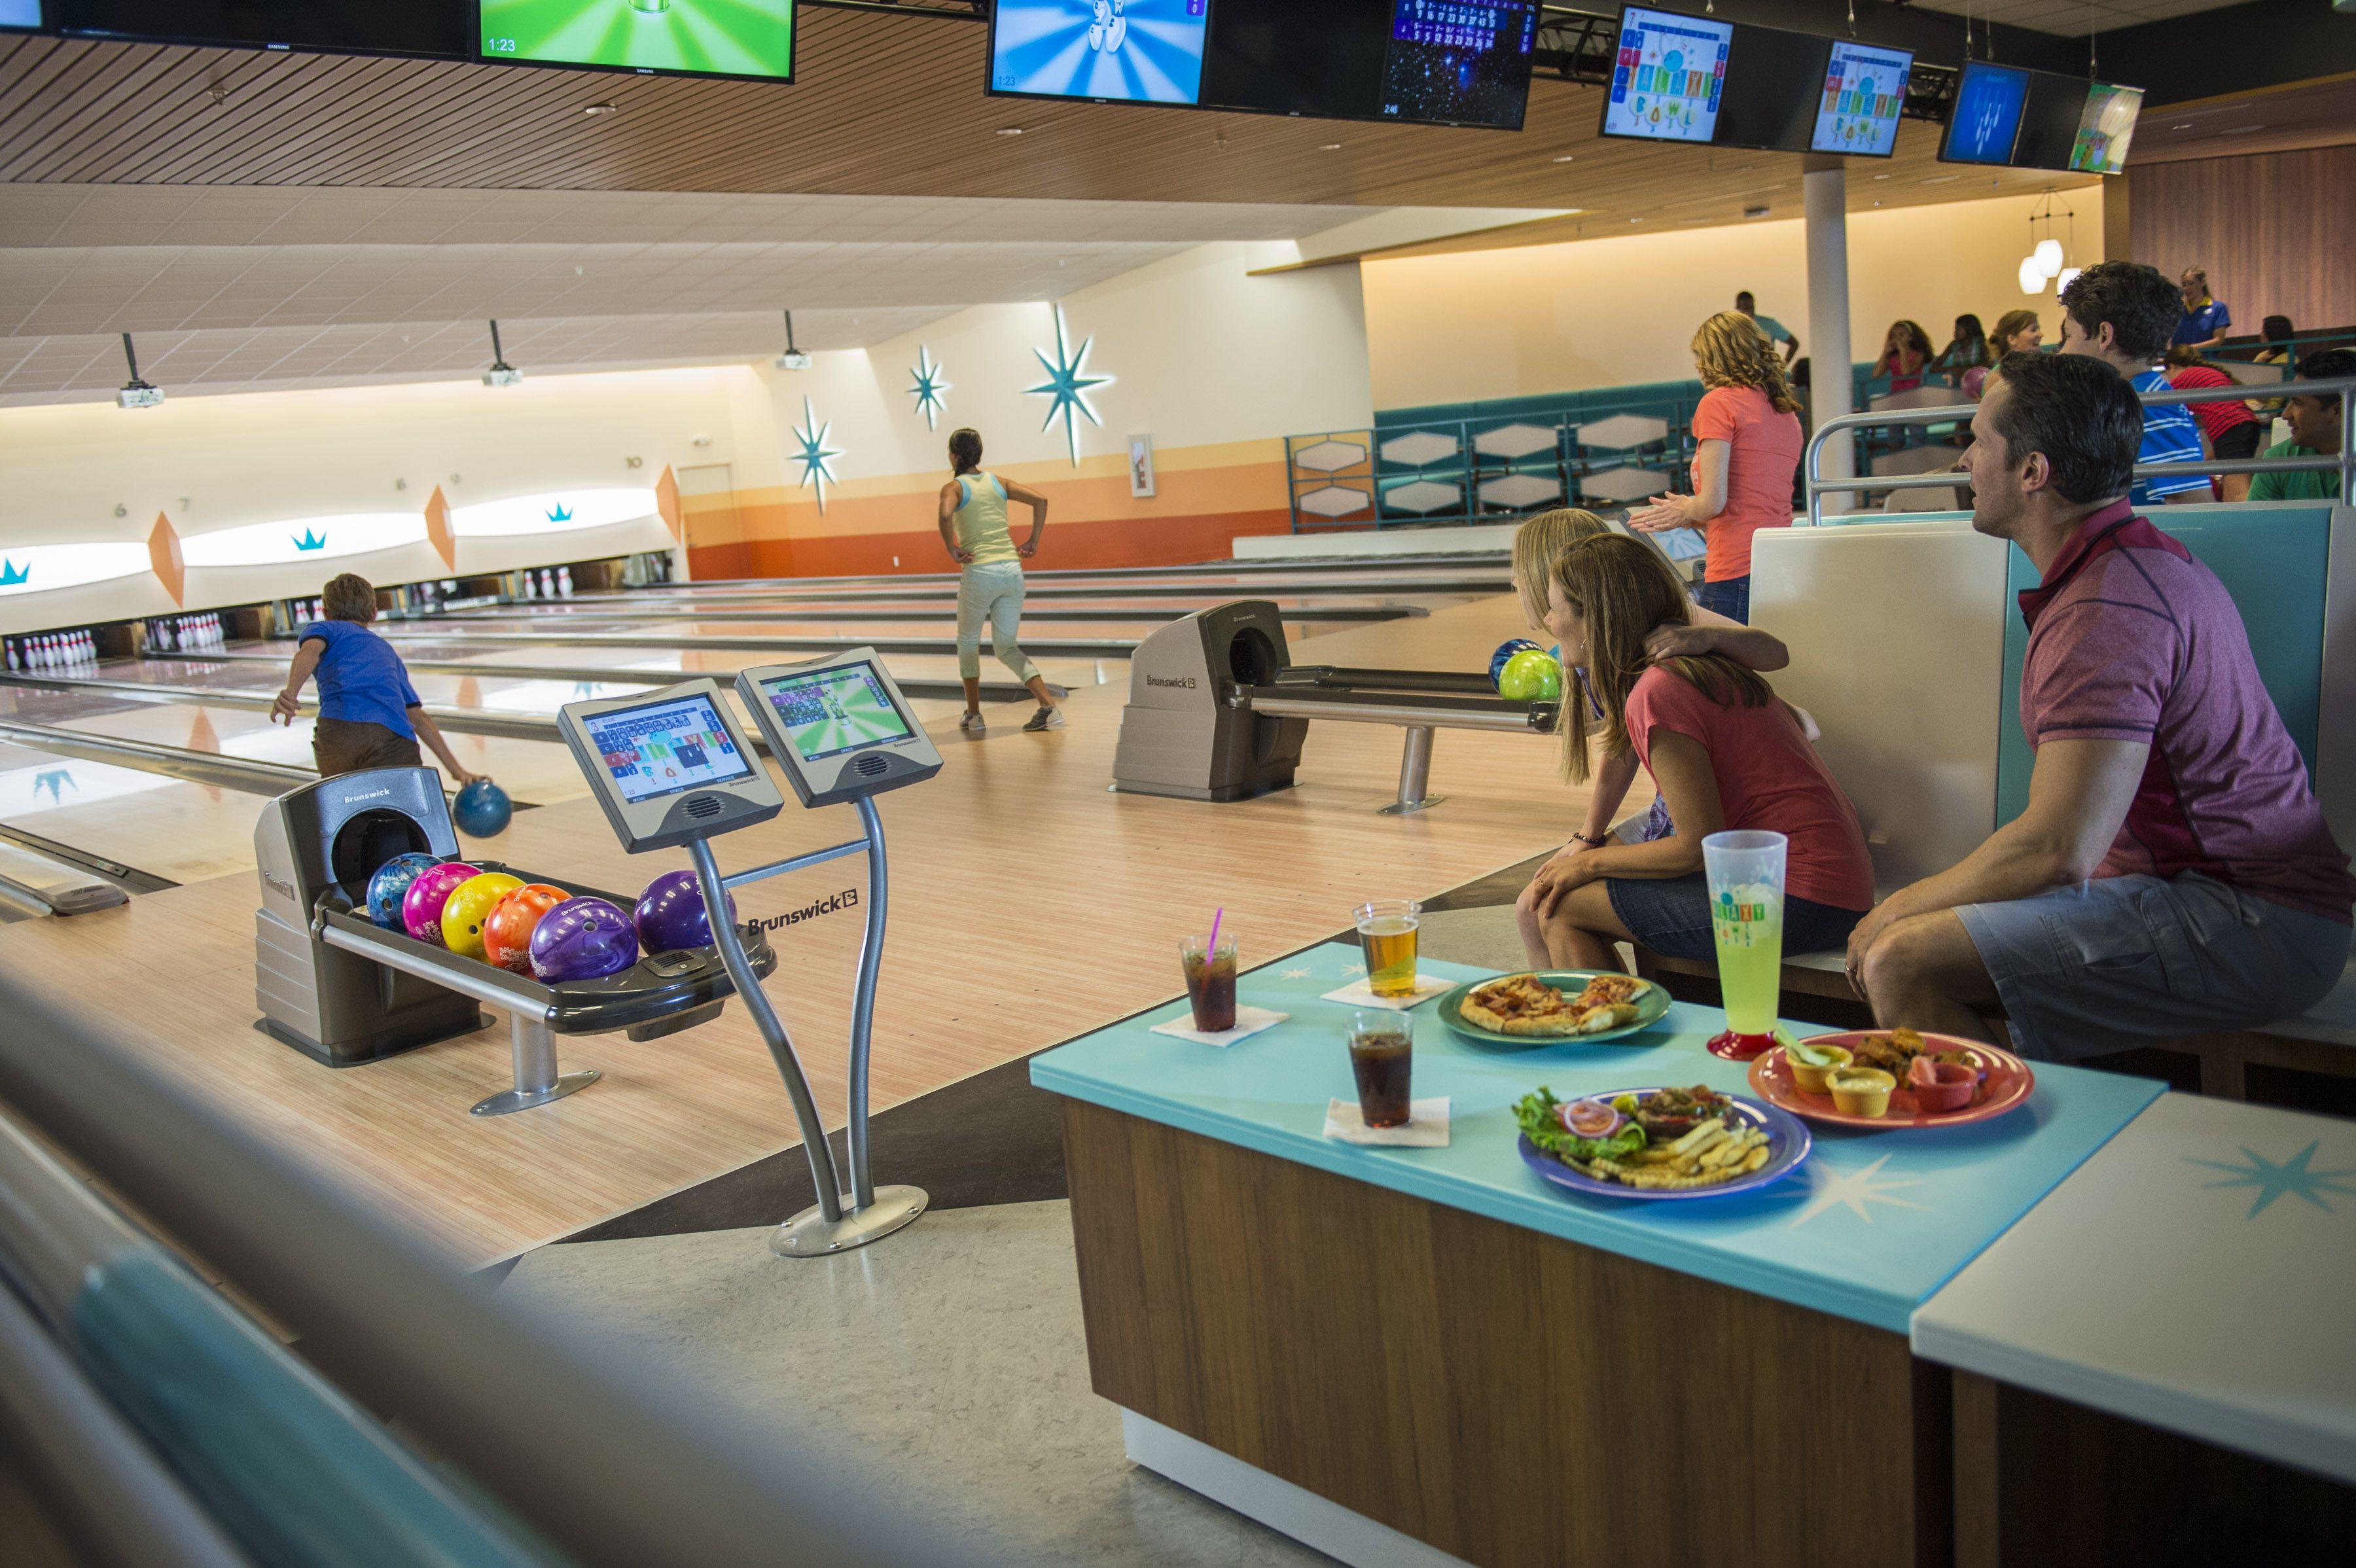 Family enjoying Universal Orlando's Cabana Bay Galaxy Bowling.